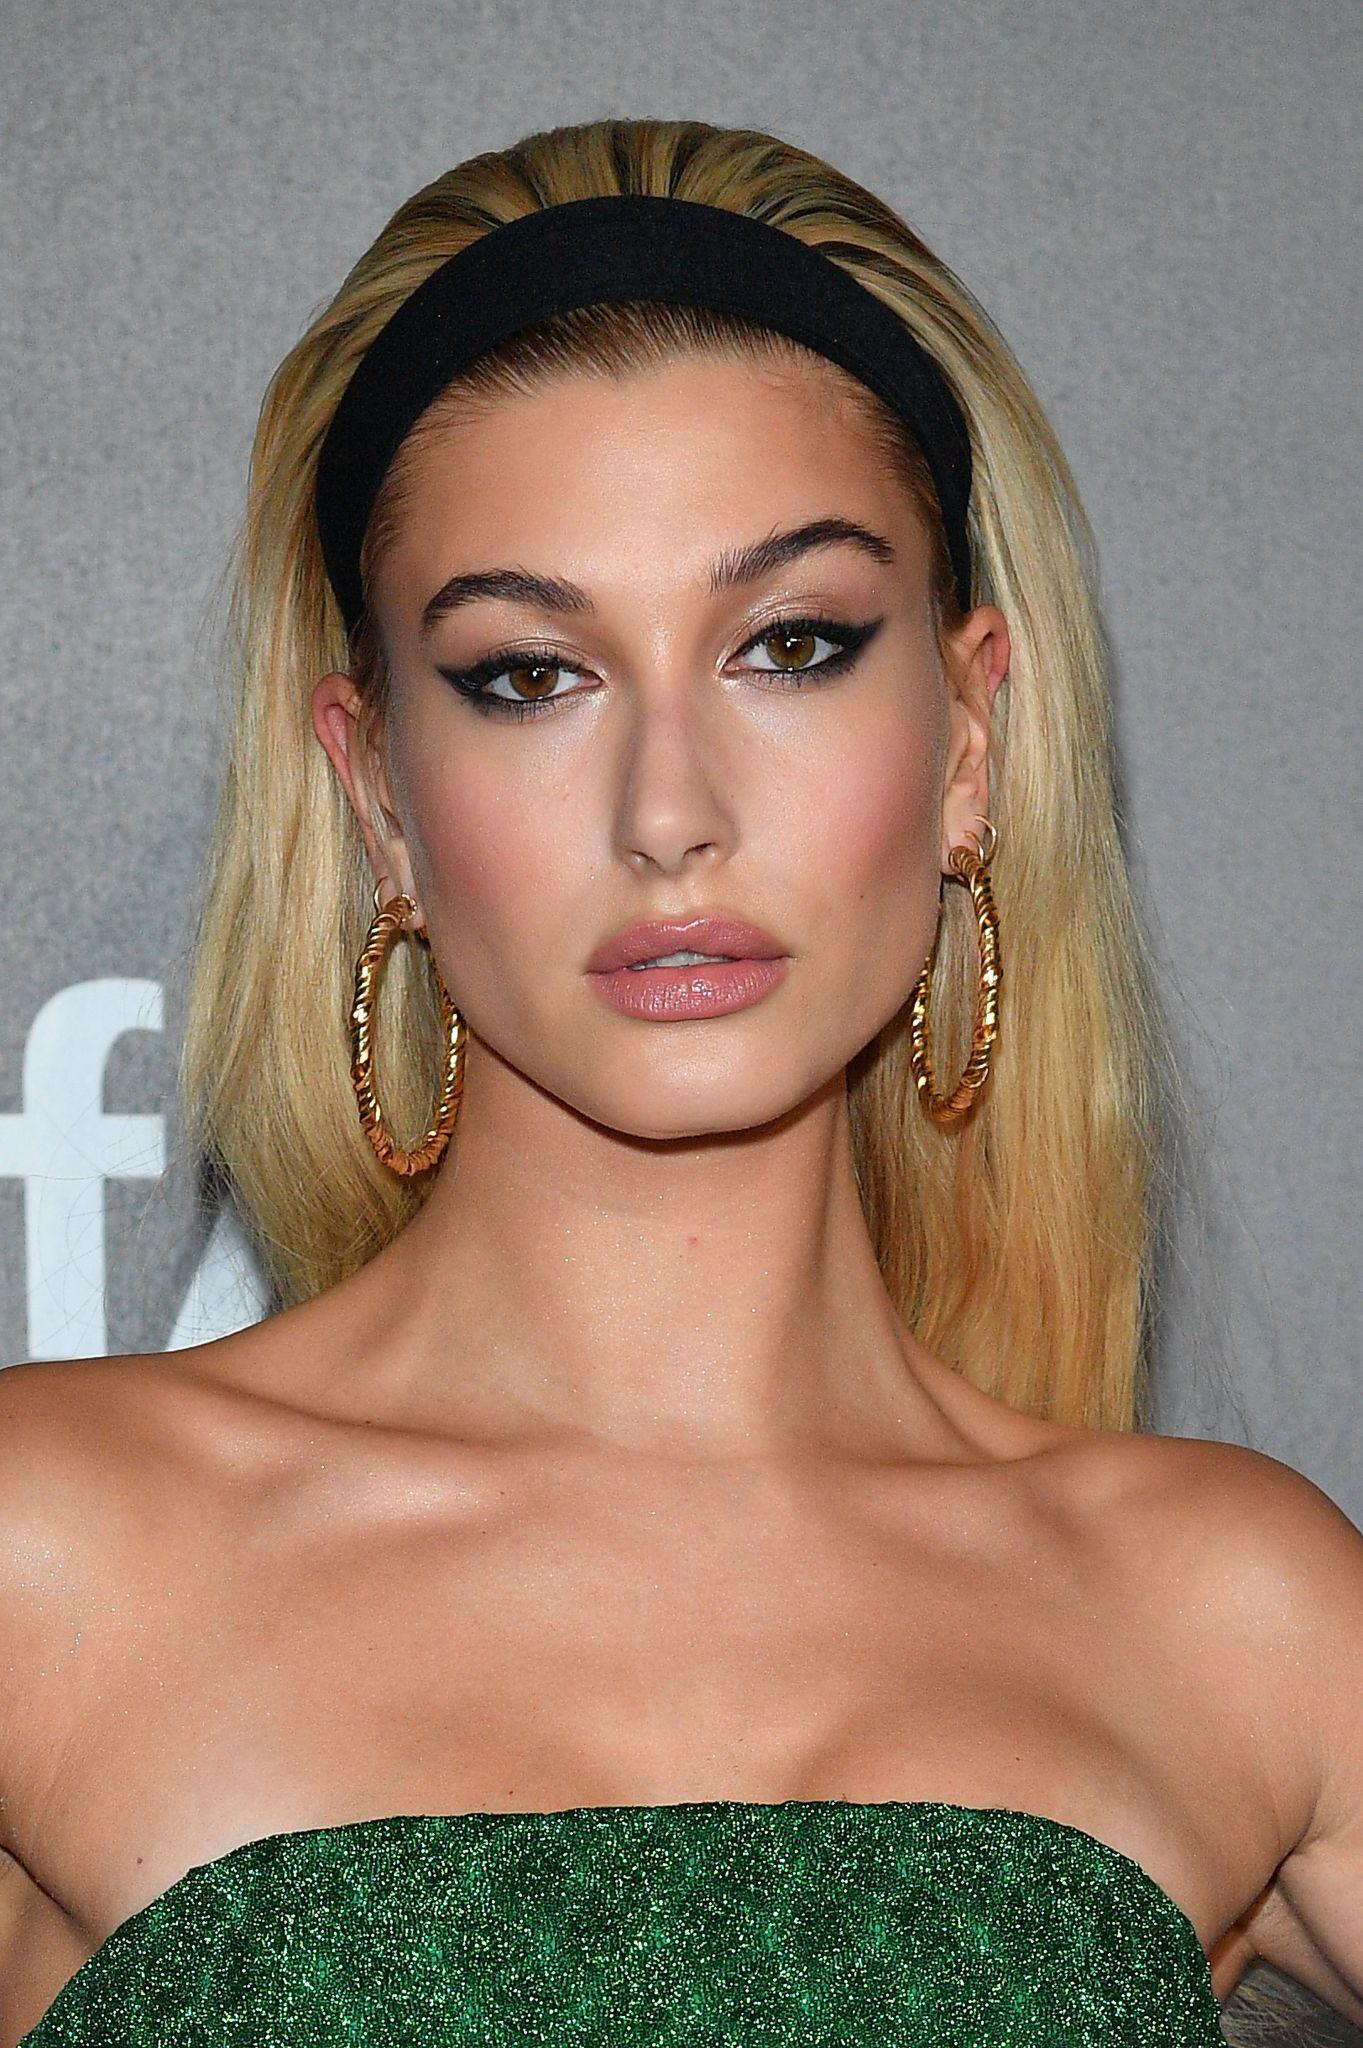 57 Hottest Women Celebrities ...